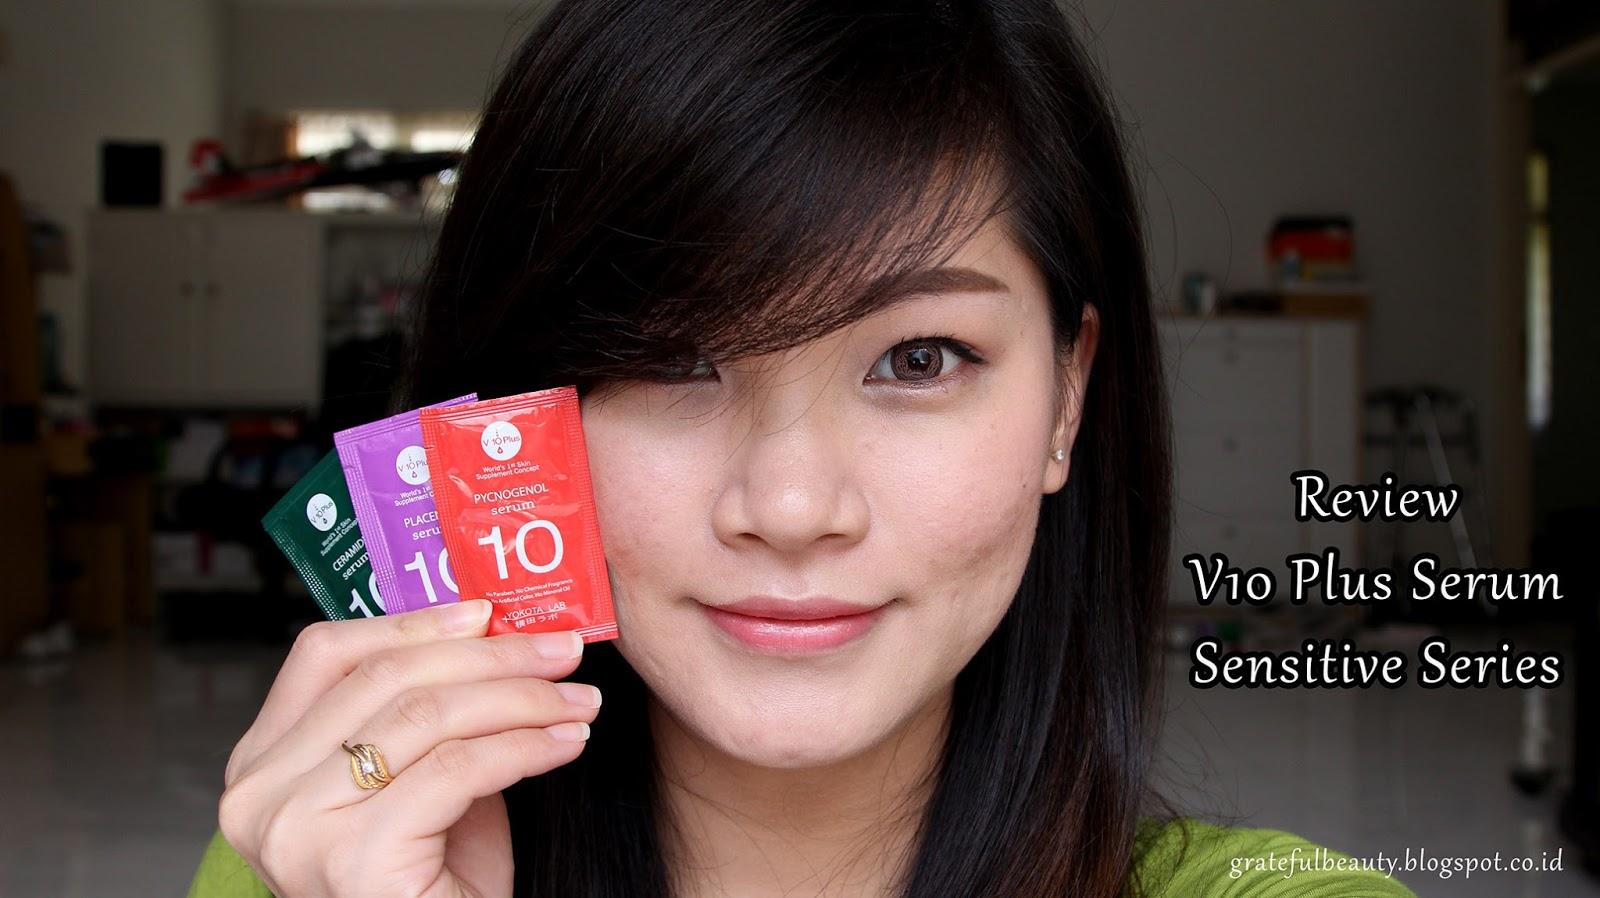 Sponsored Review V10 Plus Serum Sensitive Skin Series Kornelia